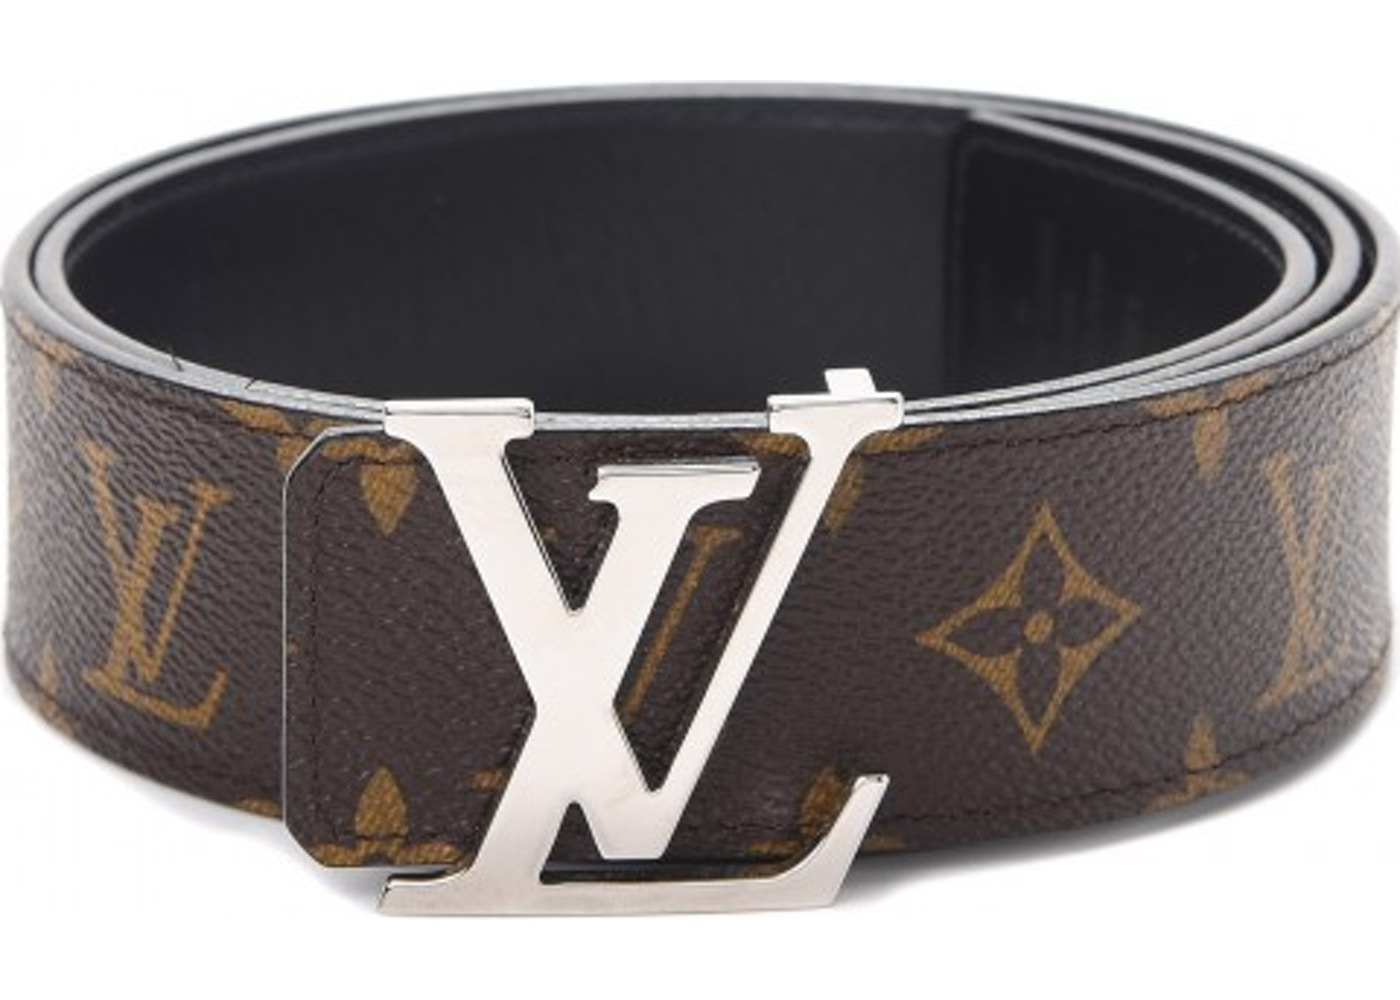 2ac1cf043f5c Louis Vuitton Belt LV Initiales Reversible 1.5 Width Monogram Noir ...